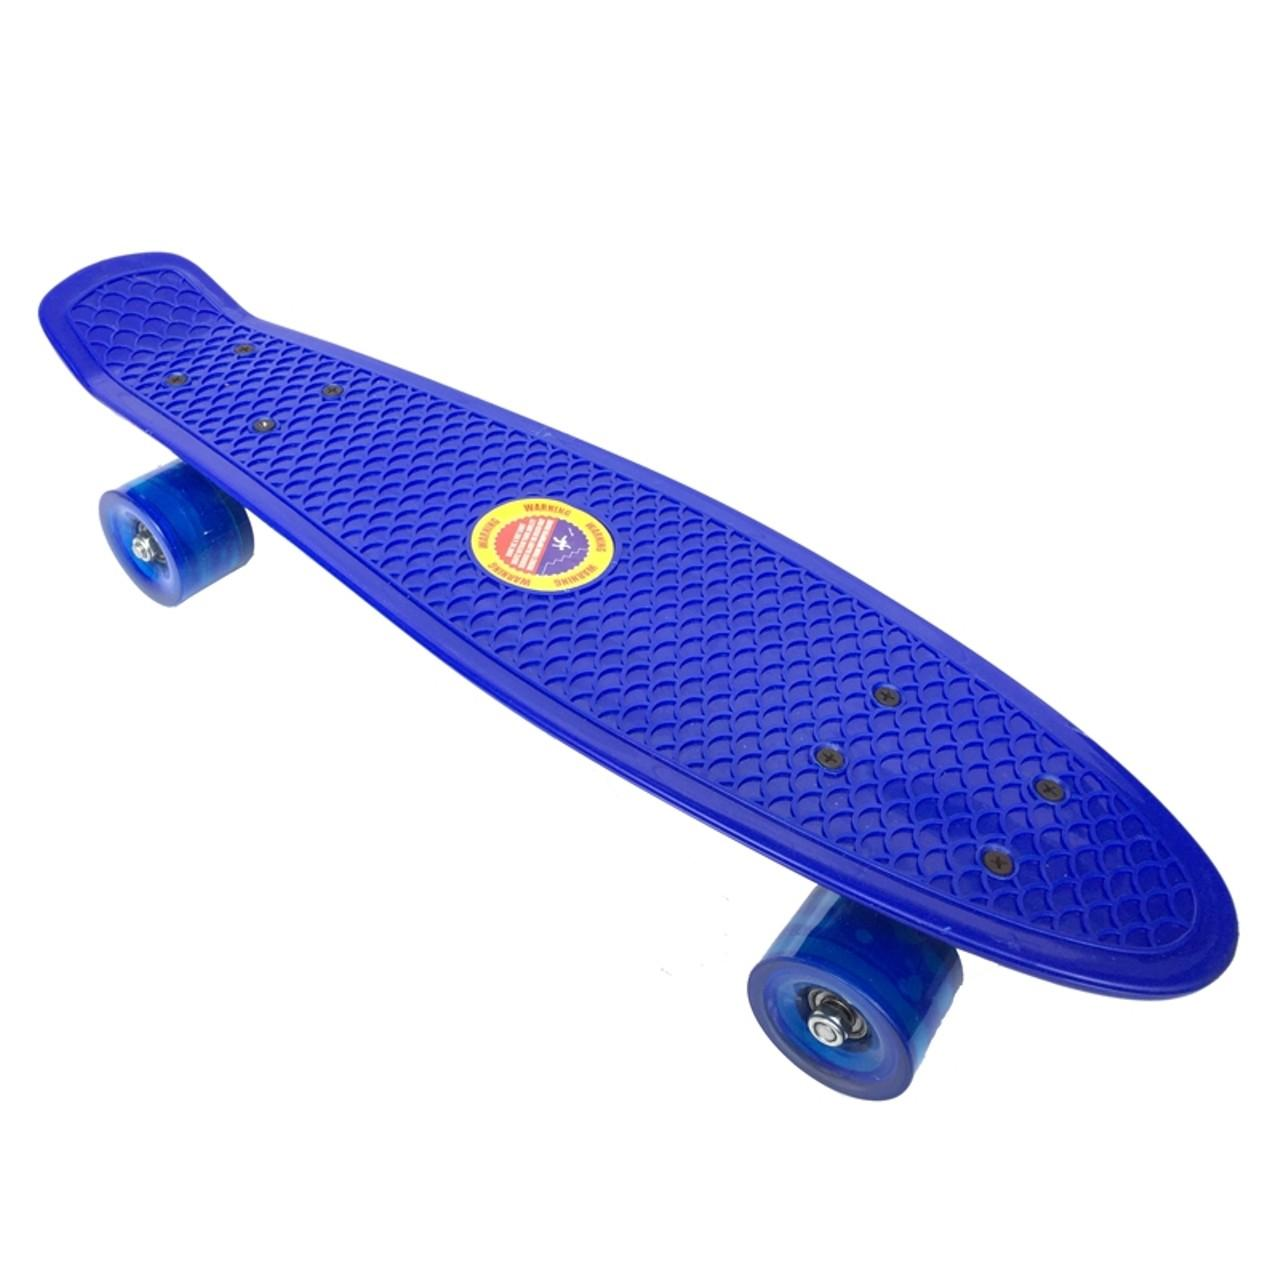 Ván trượt Skateboard Penny thể thao siêu đẹp.